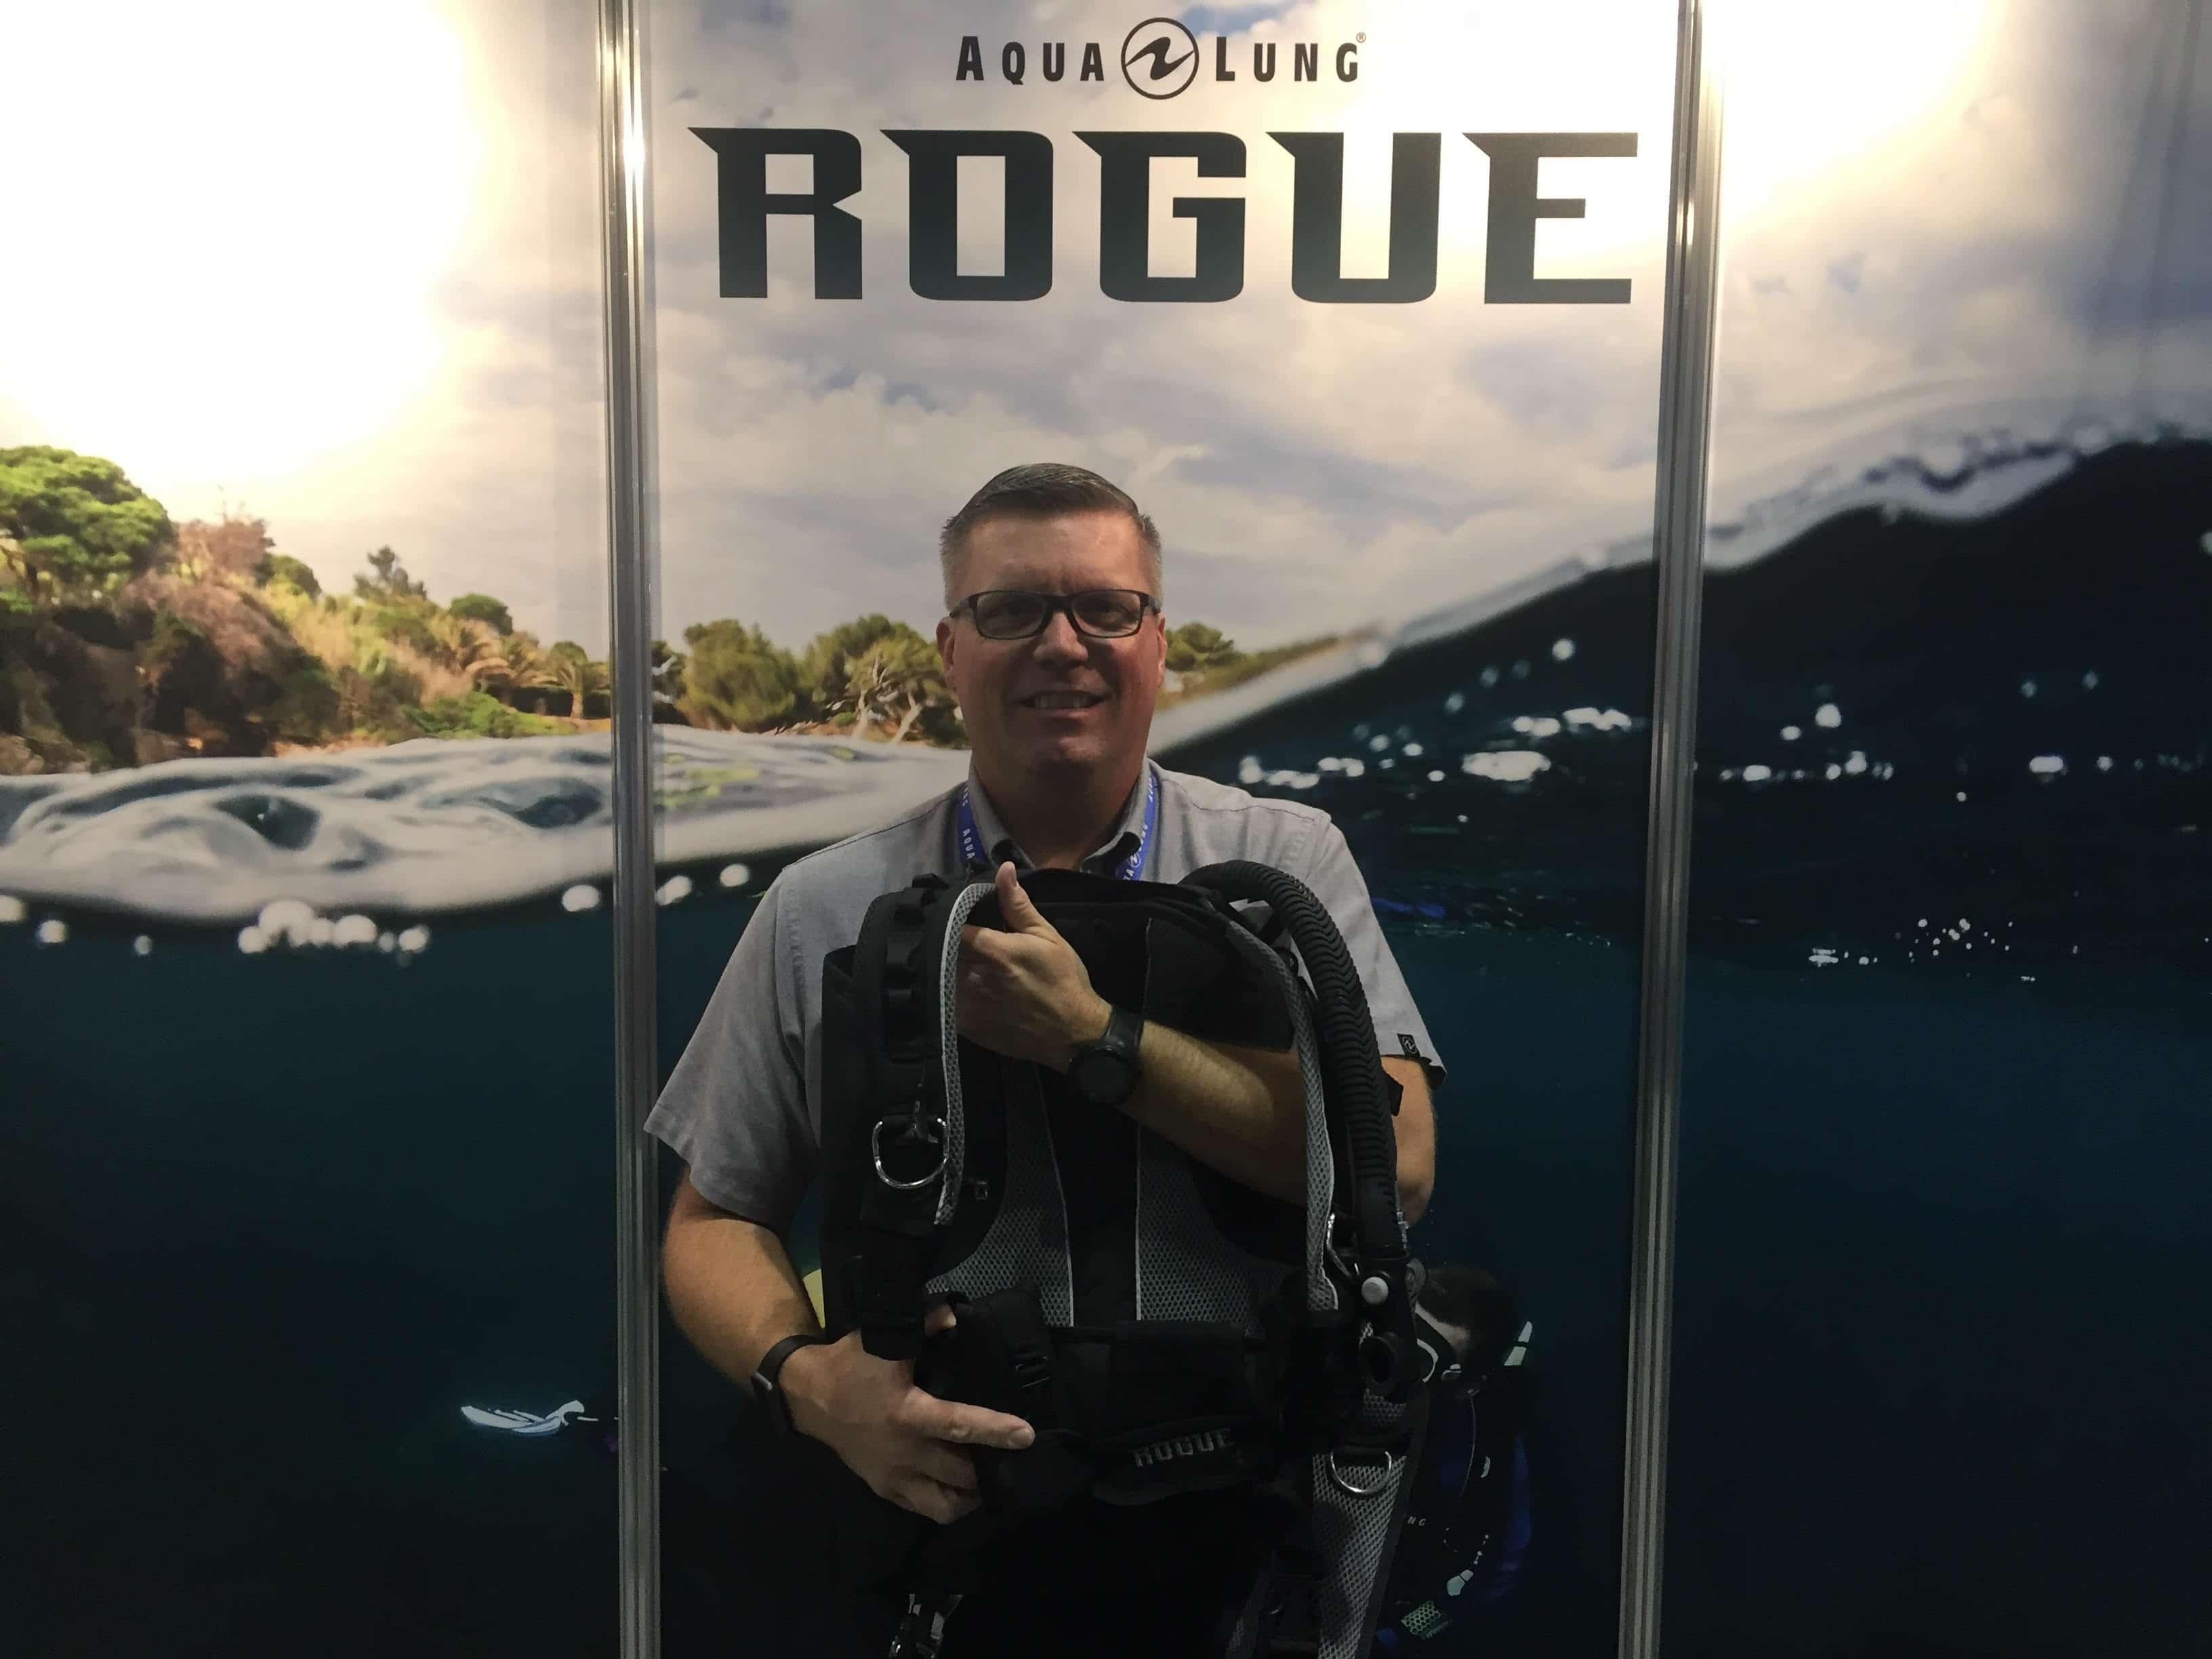 Aqualung Introduces New Rogue Modular BCD